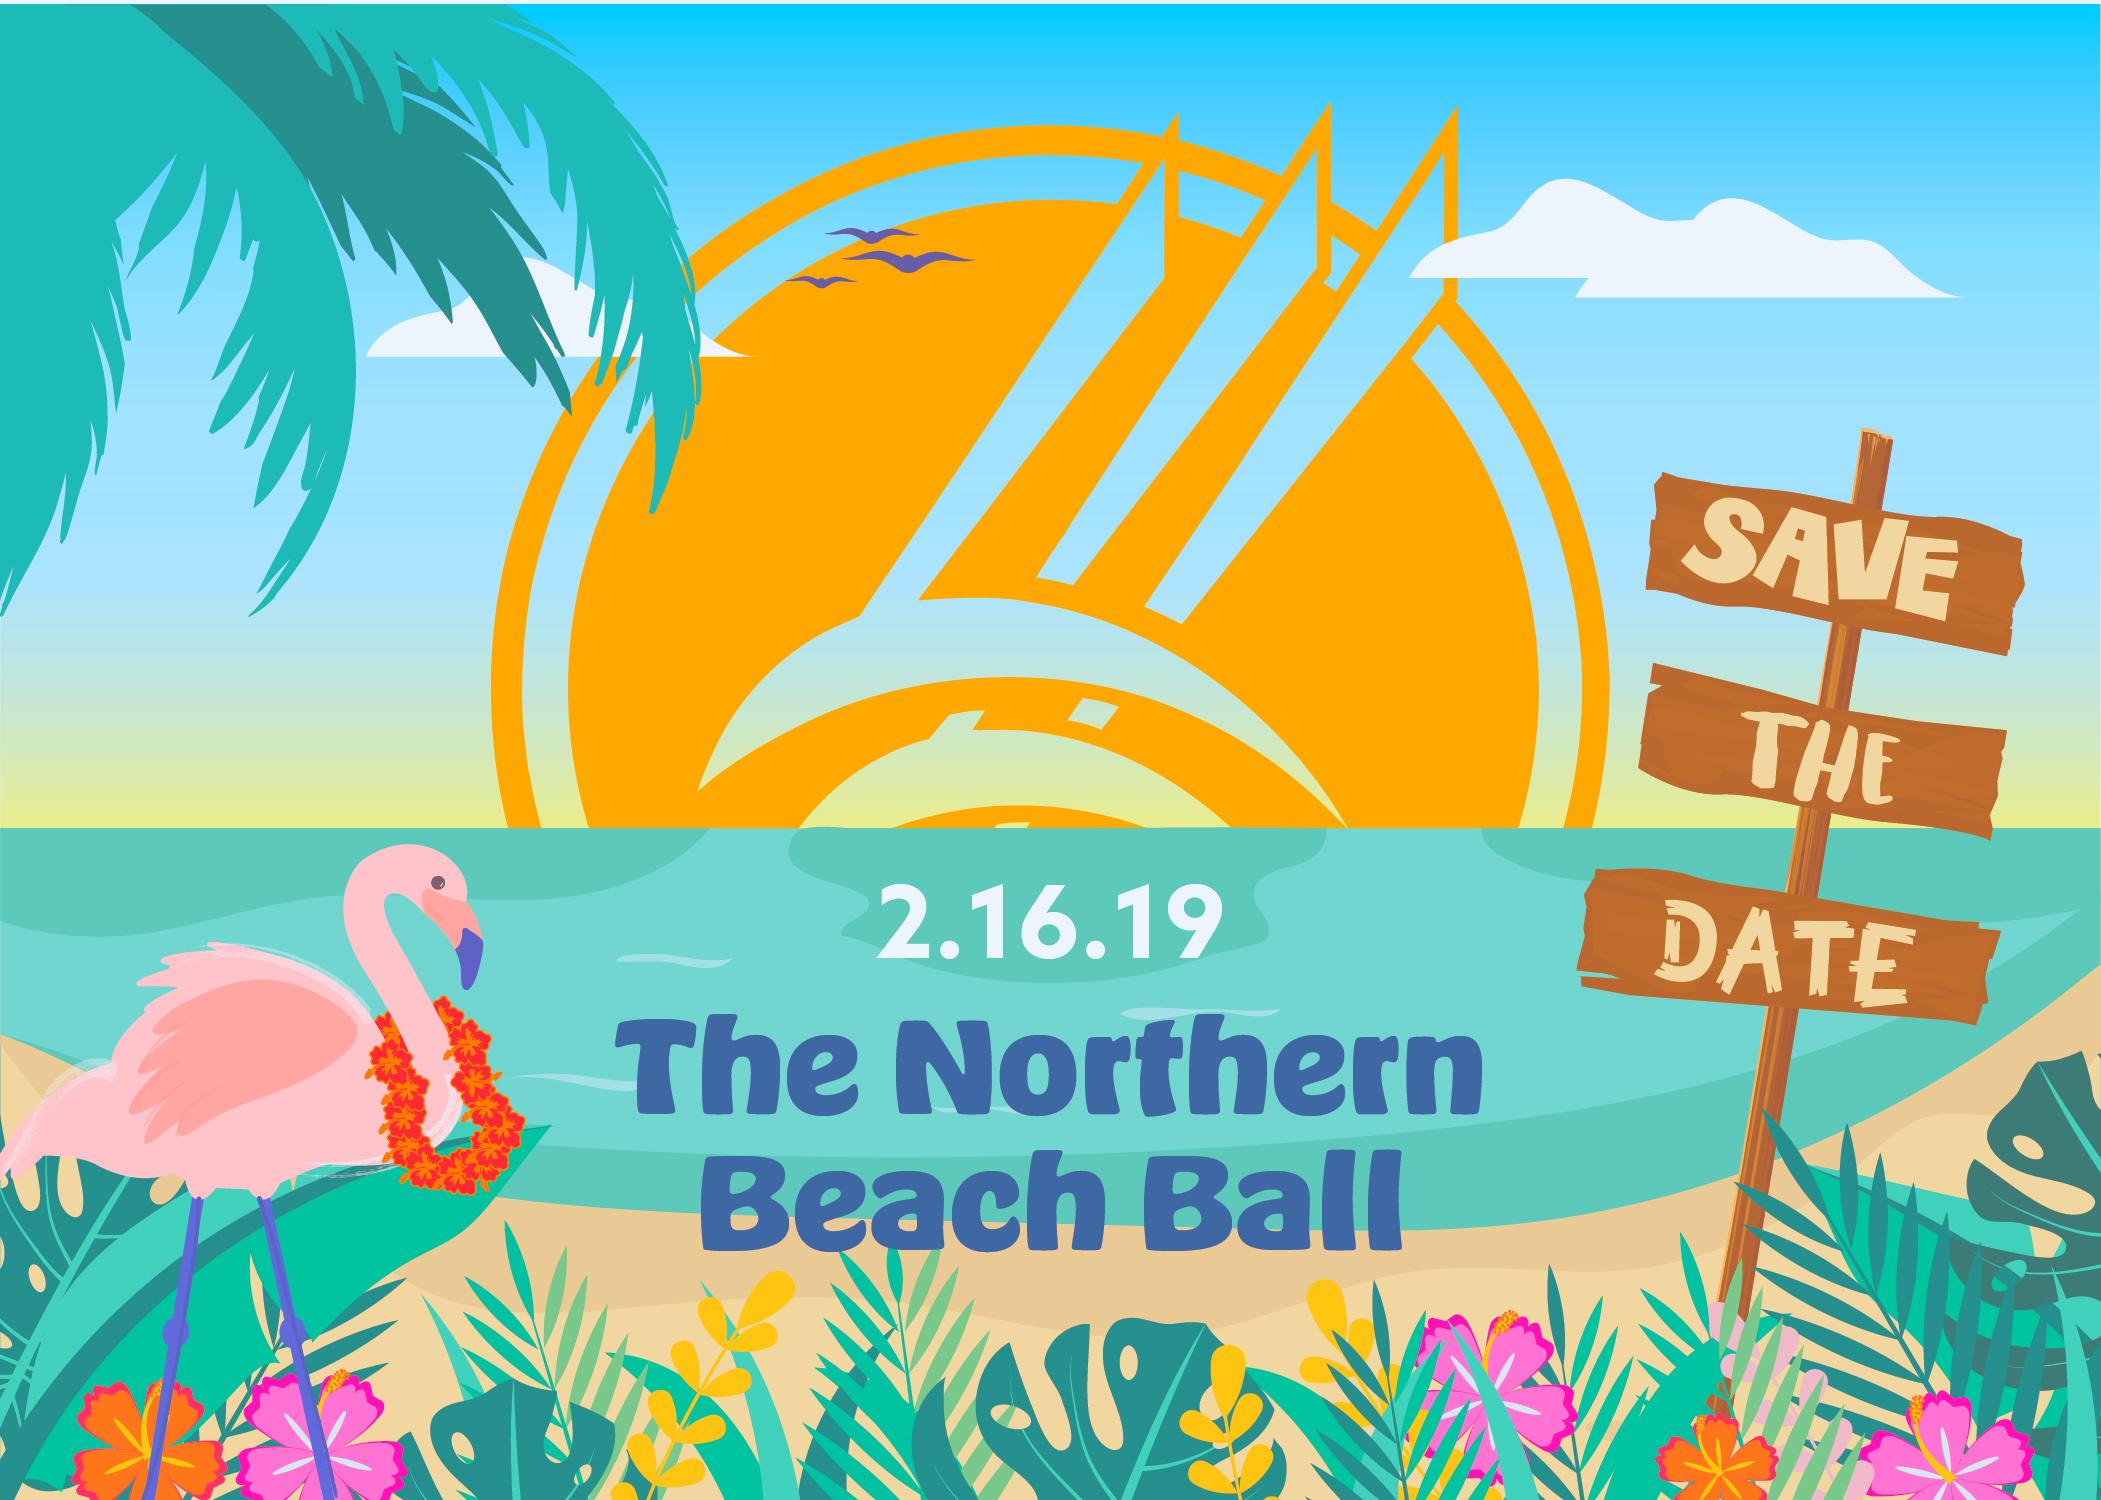 The Northern Beach Ball